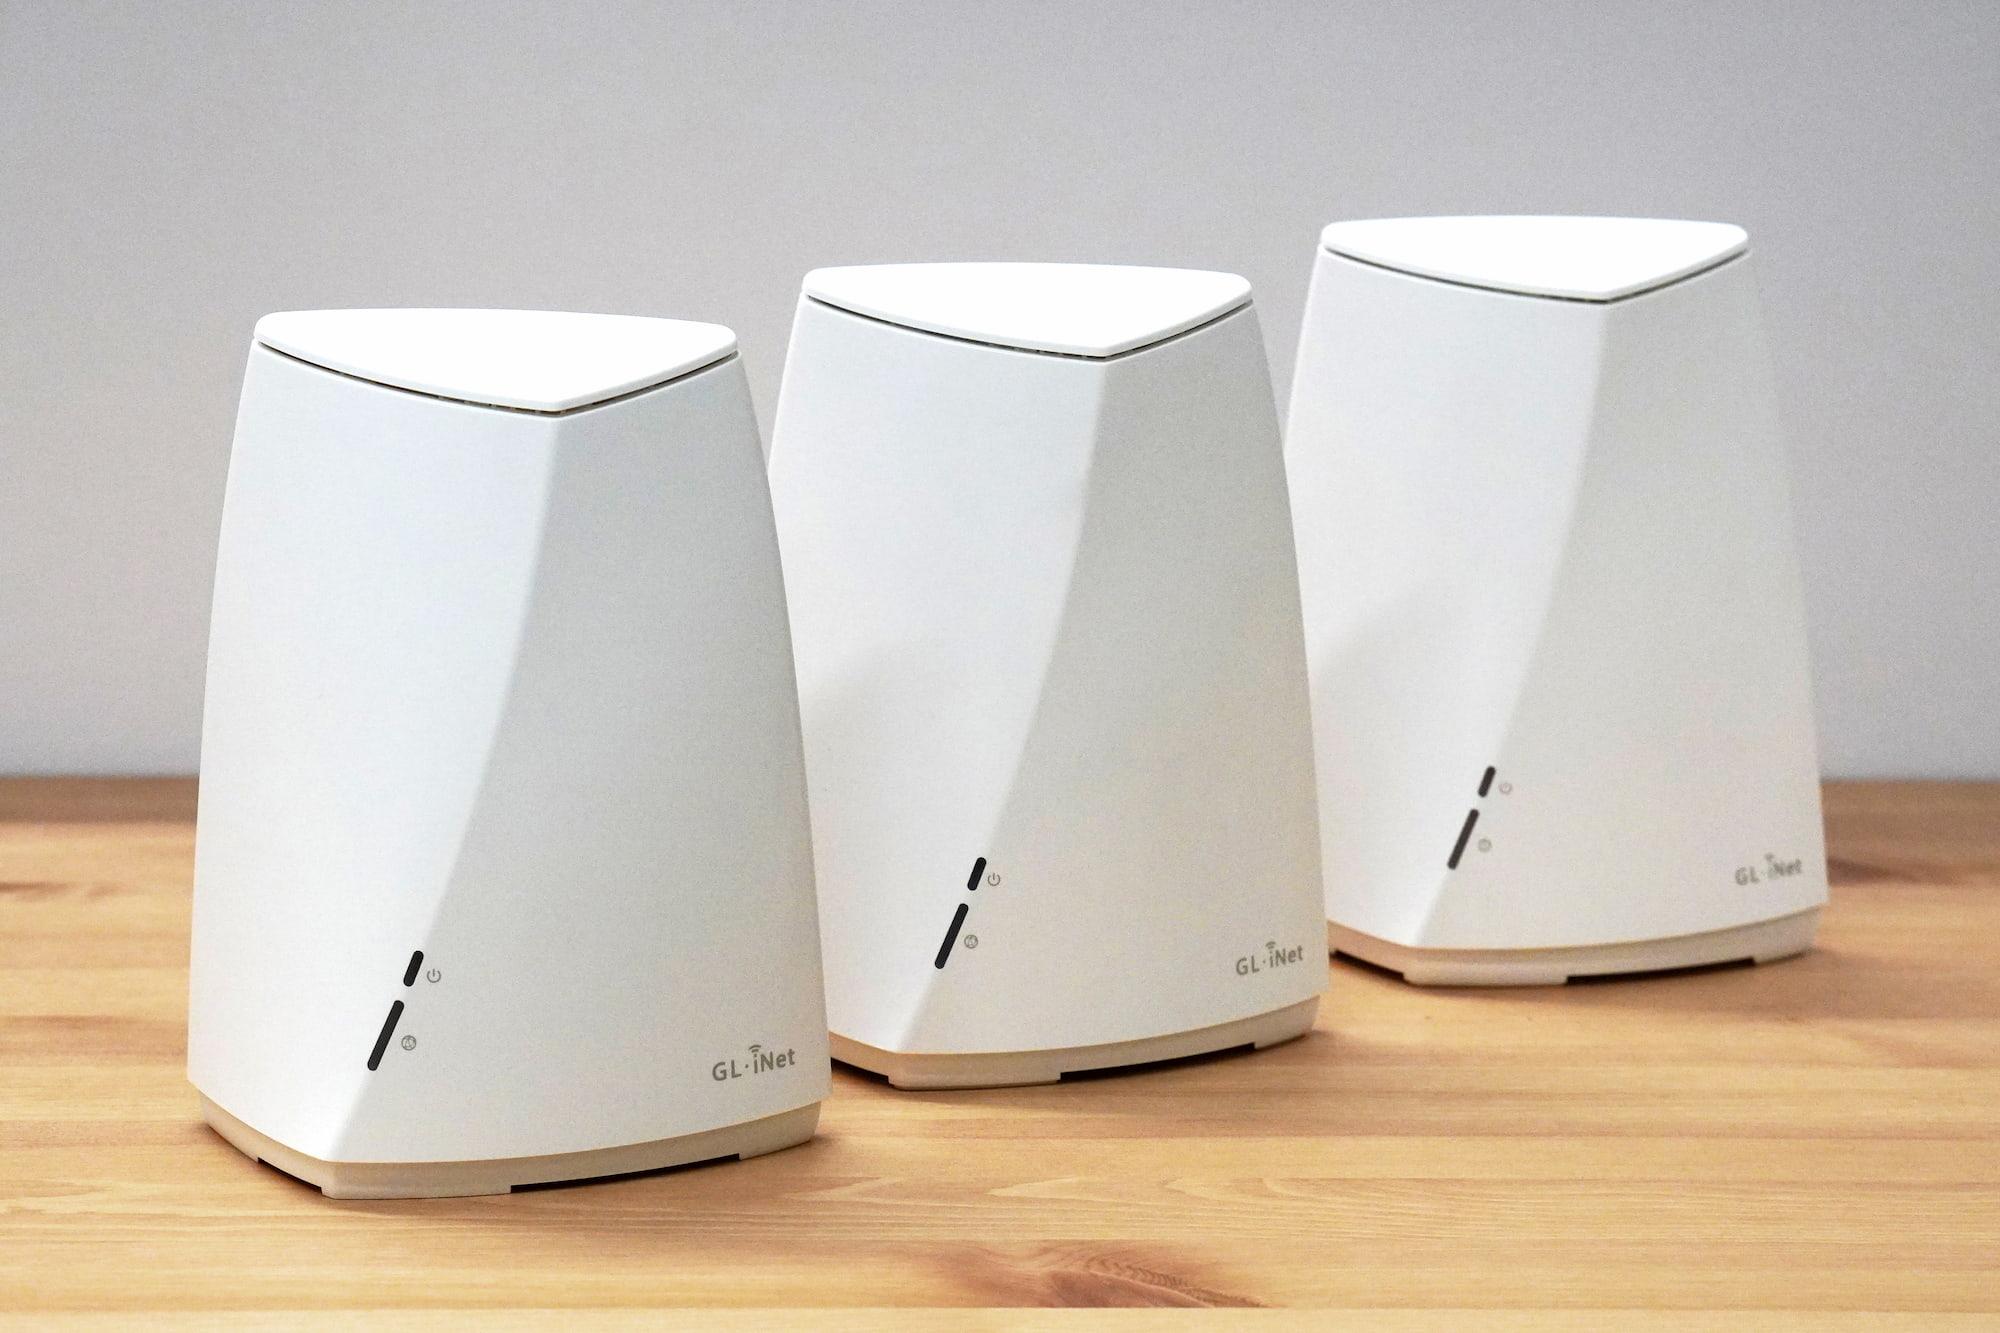 GL.iNet Velica Home Mesh Router